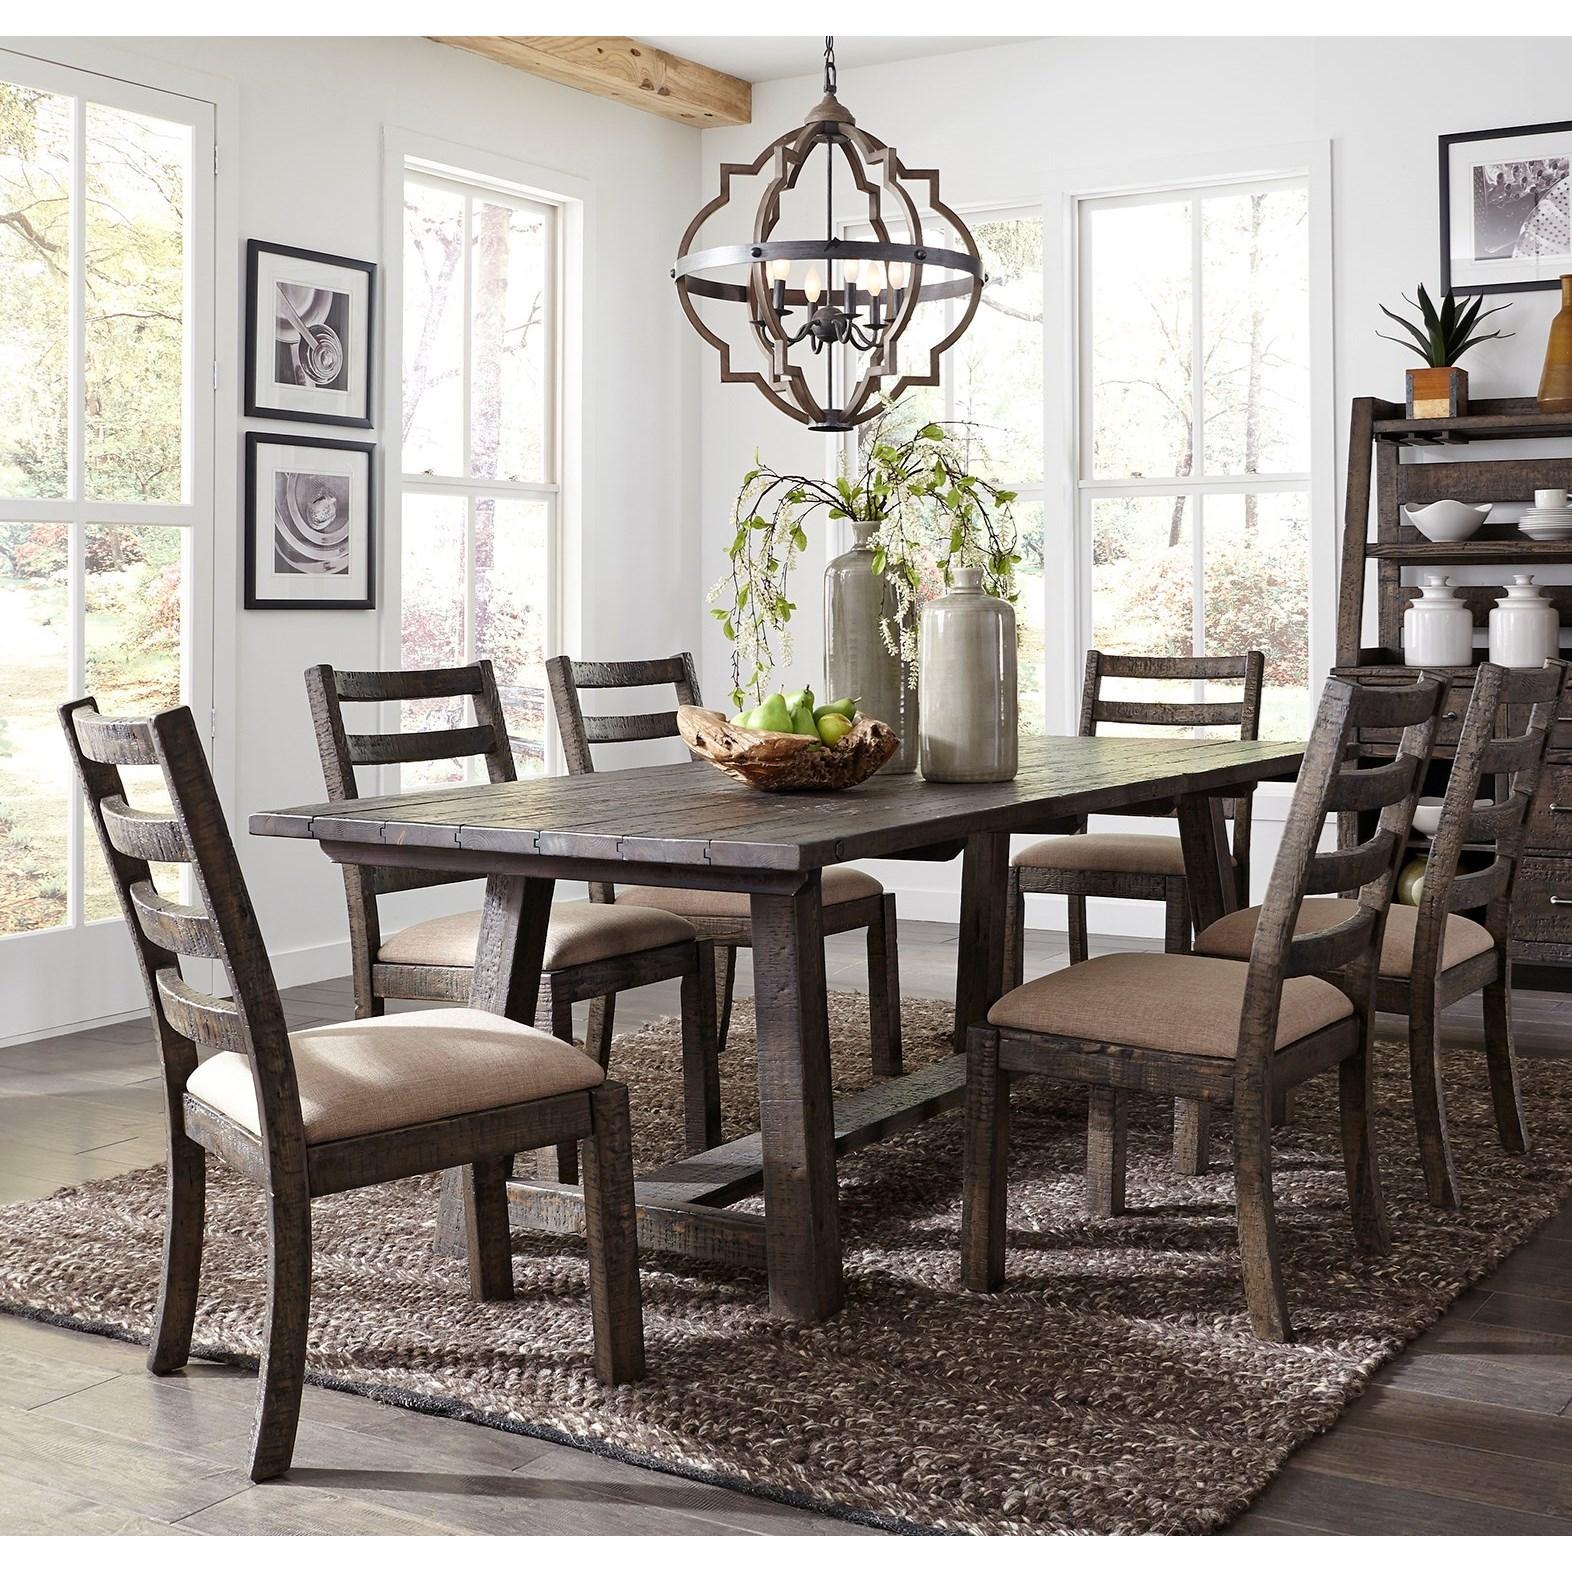 Liberty furniture prescott valley rustic 7 piece 96 for Furniture 96